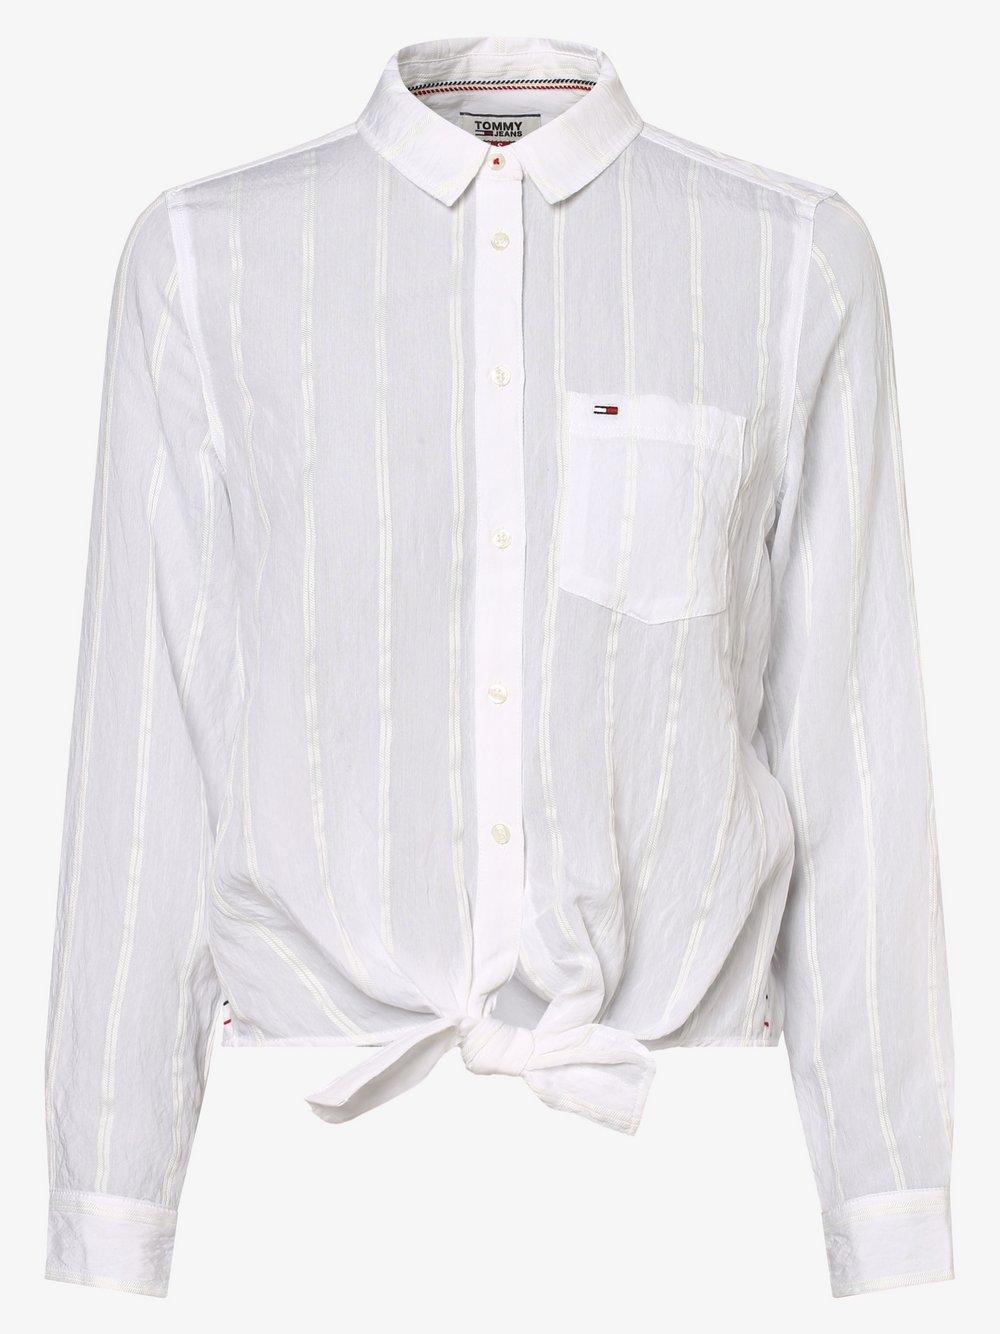 Tommy Jeans - Bluzka damska, biały